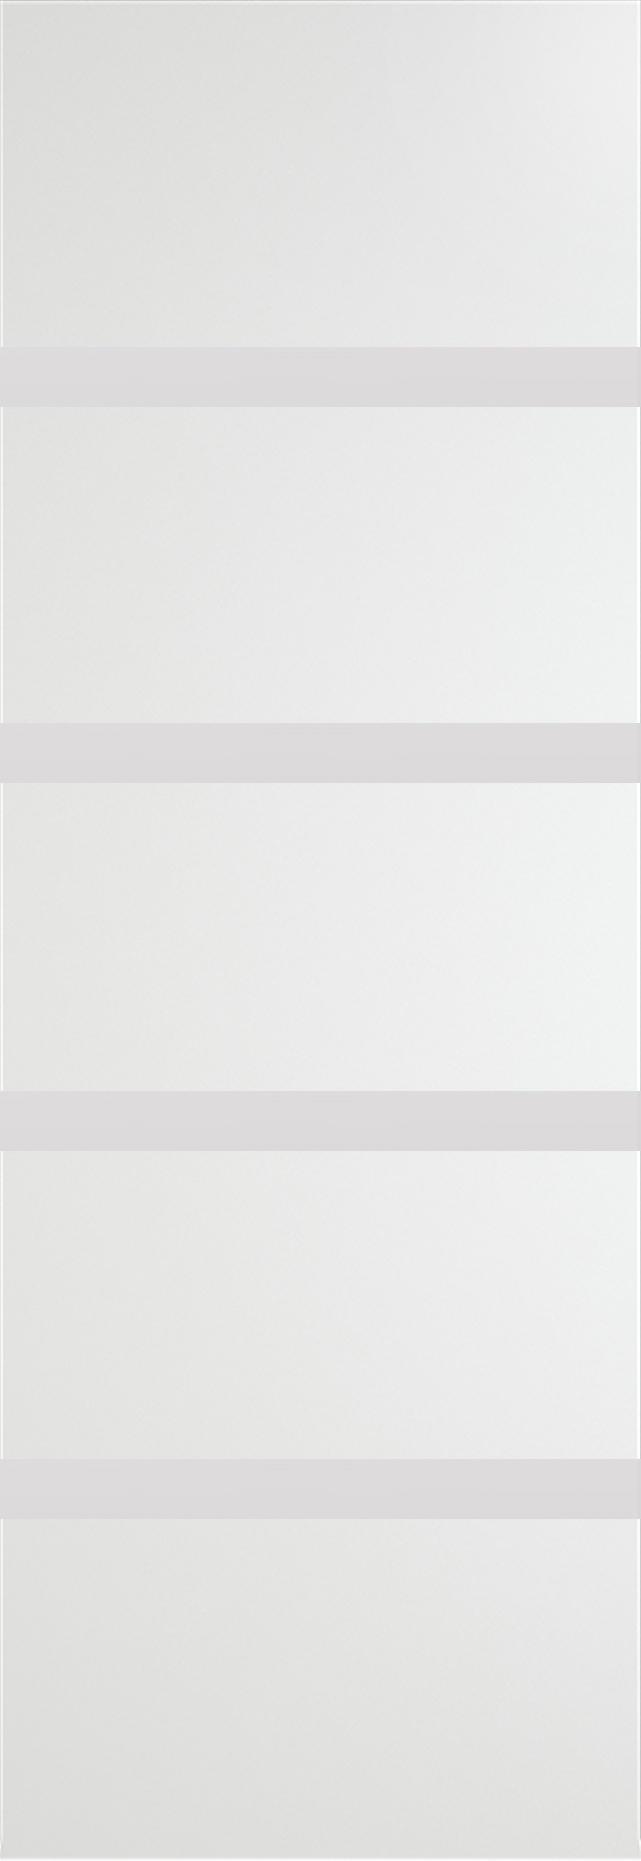 Tivoli Д-4 Invisible цвет - Белая эмаль Без стекла (ДГ)